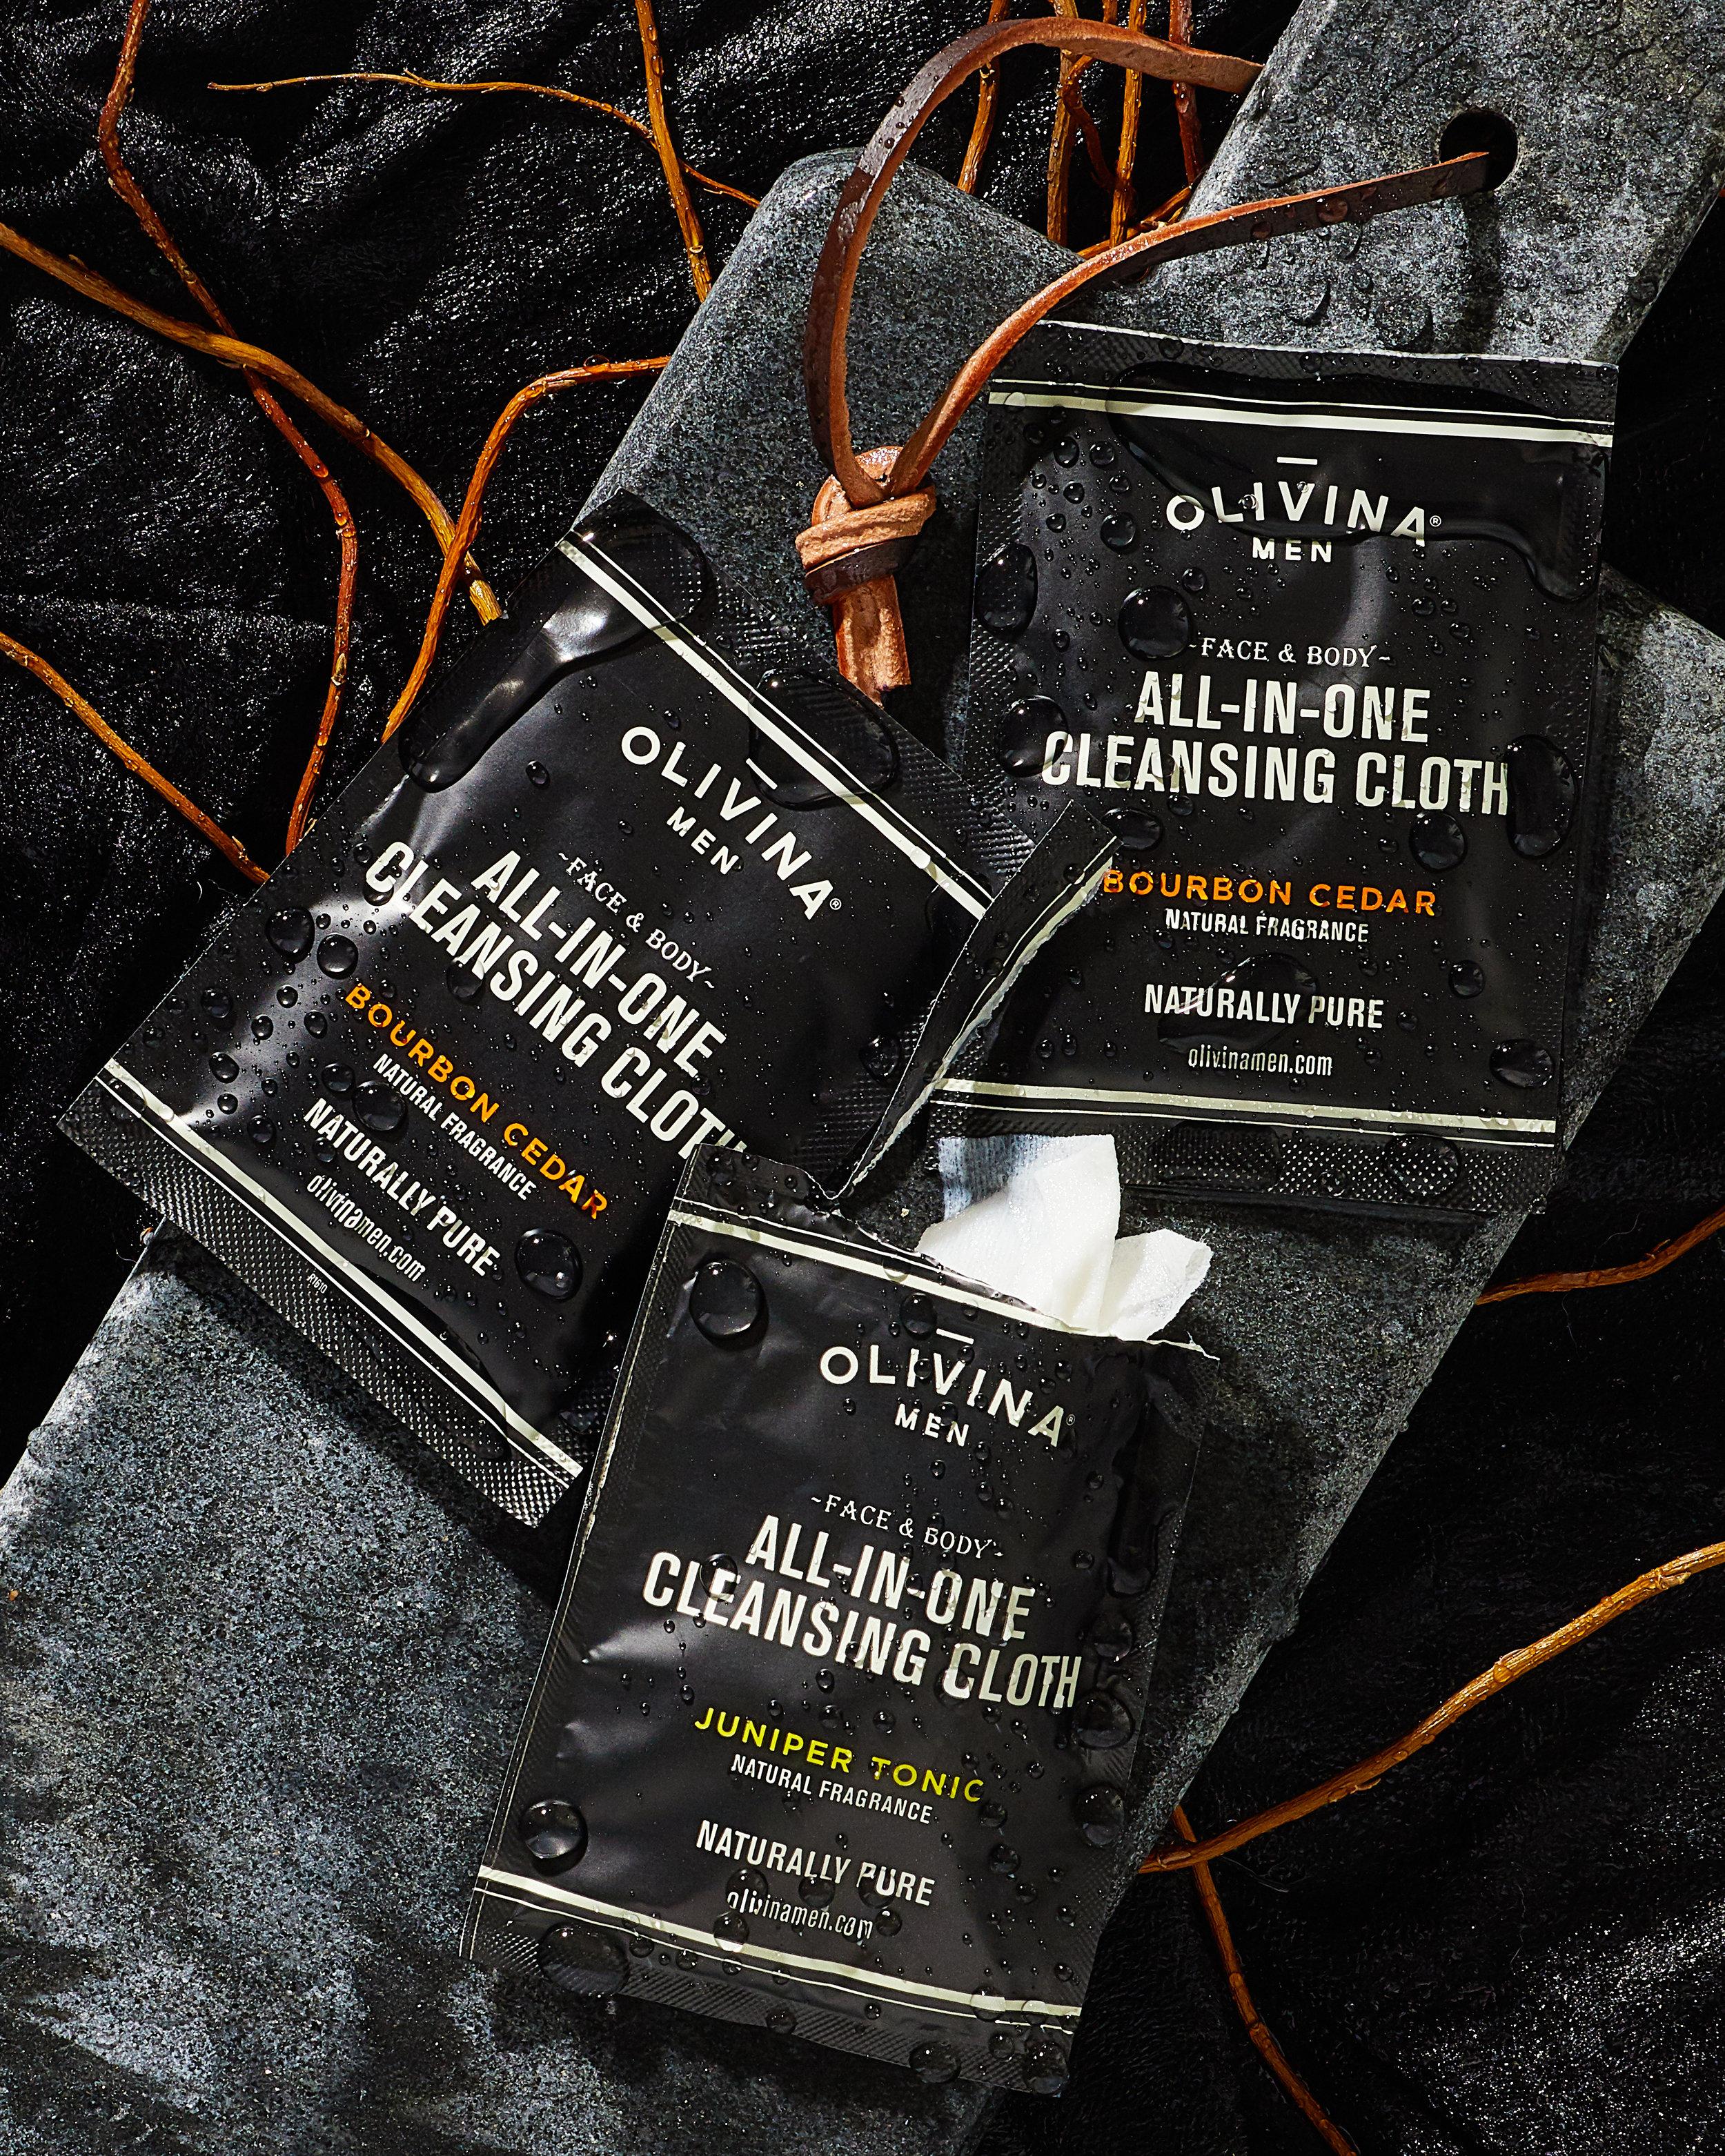 olivina_cleansing_cloth.jpg